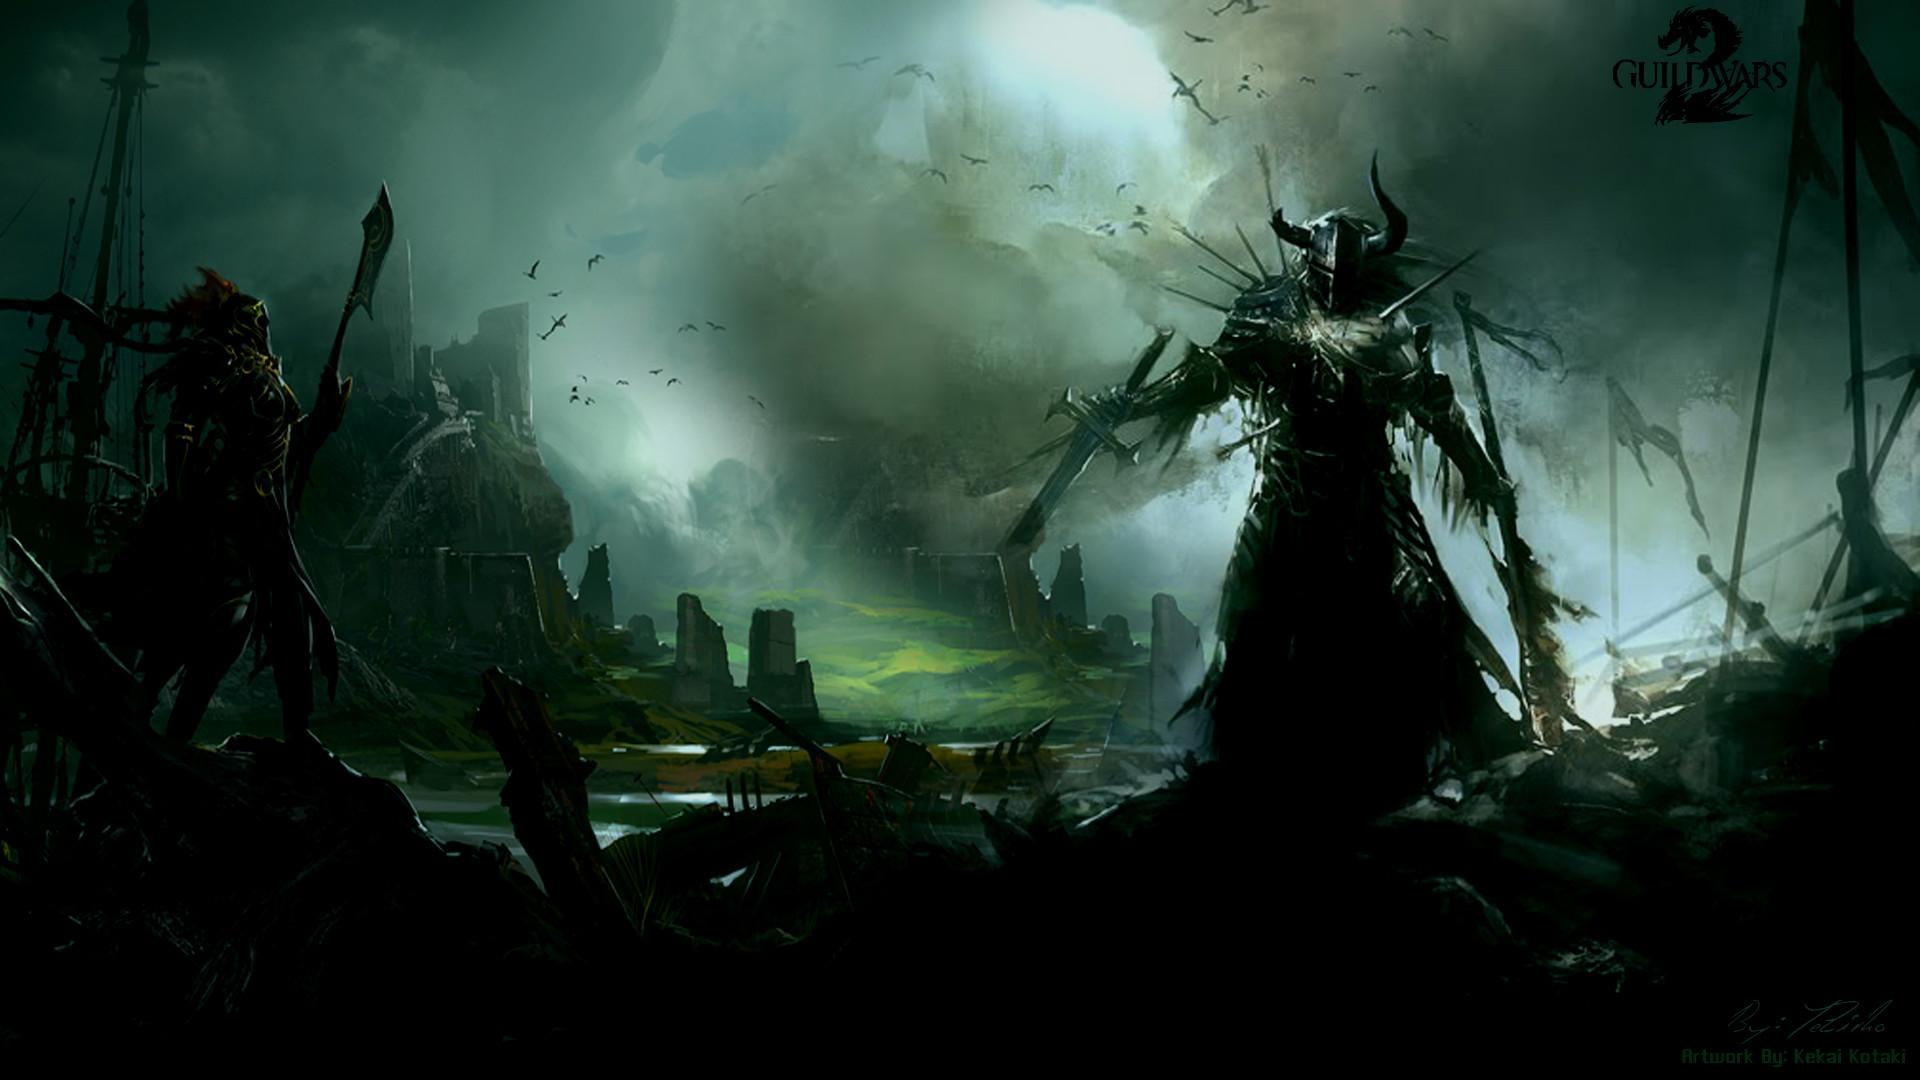 god vs devil wallpaper - photo #18